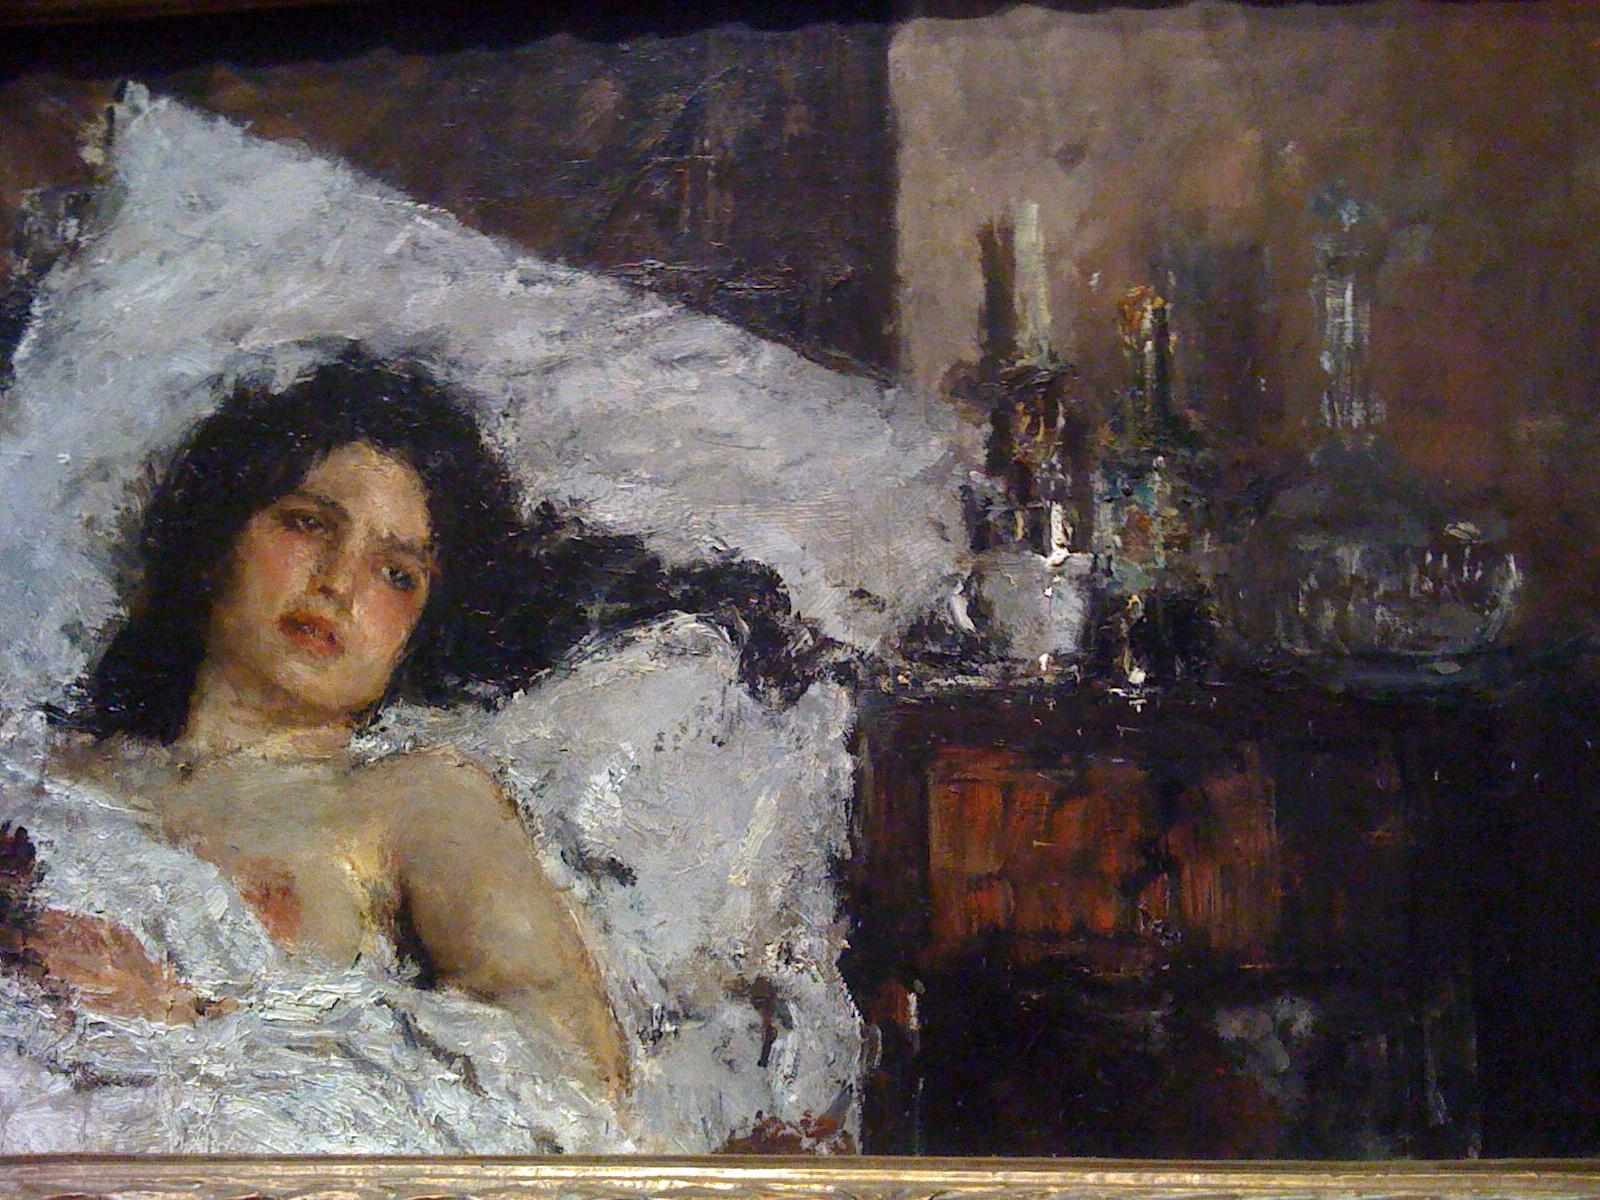 Antonio Mancini 1852 - 1930 « Paintings selected by artist Paul ...